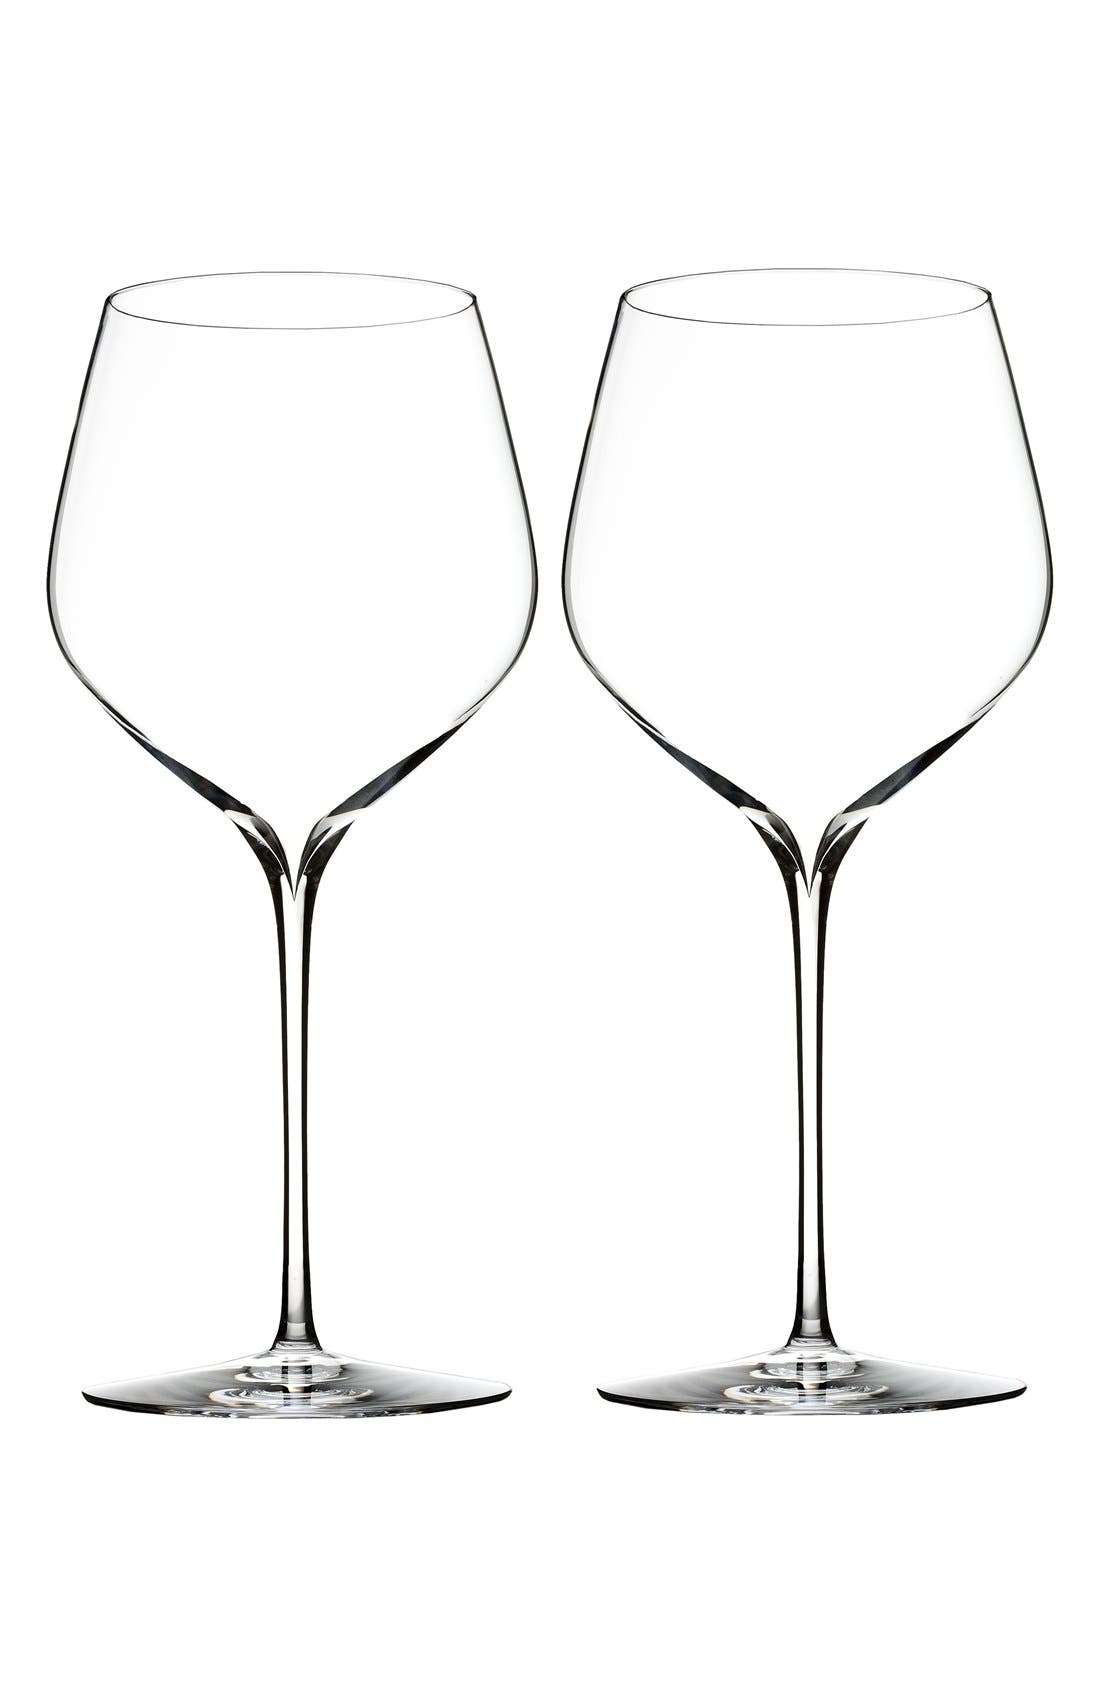 'Elegance' Fine Crystal Cabernet Sauvignon Glasses,                         Main,                         color, Clear